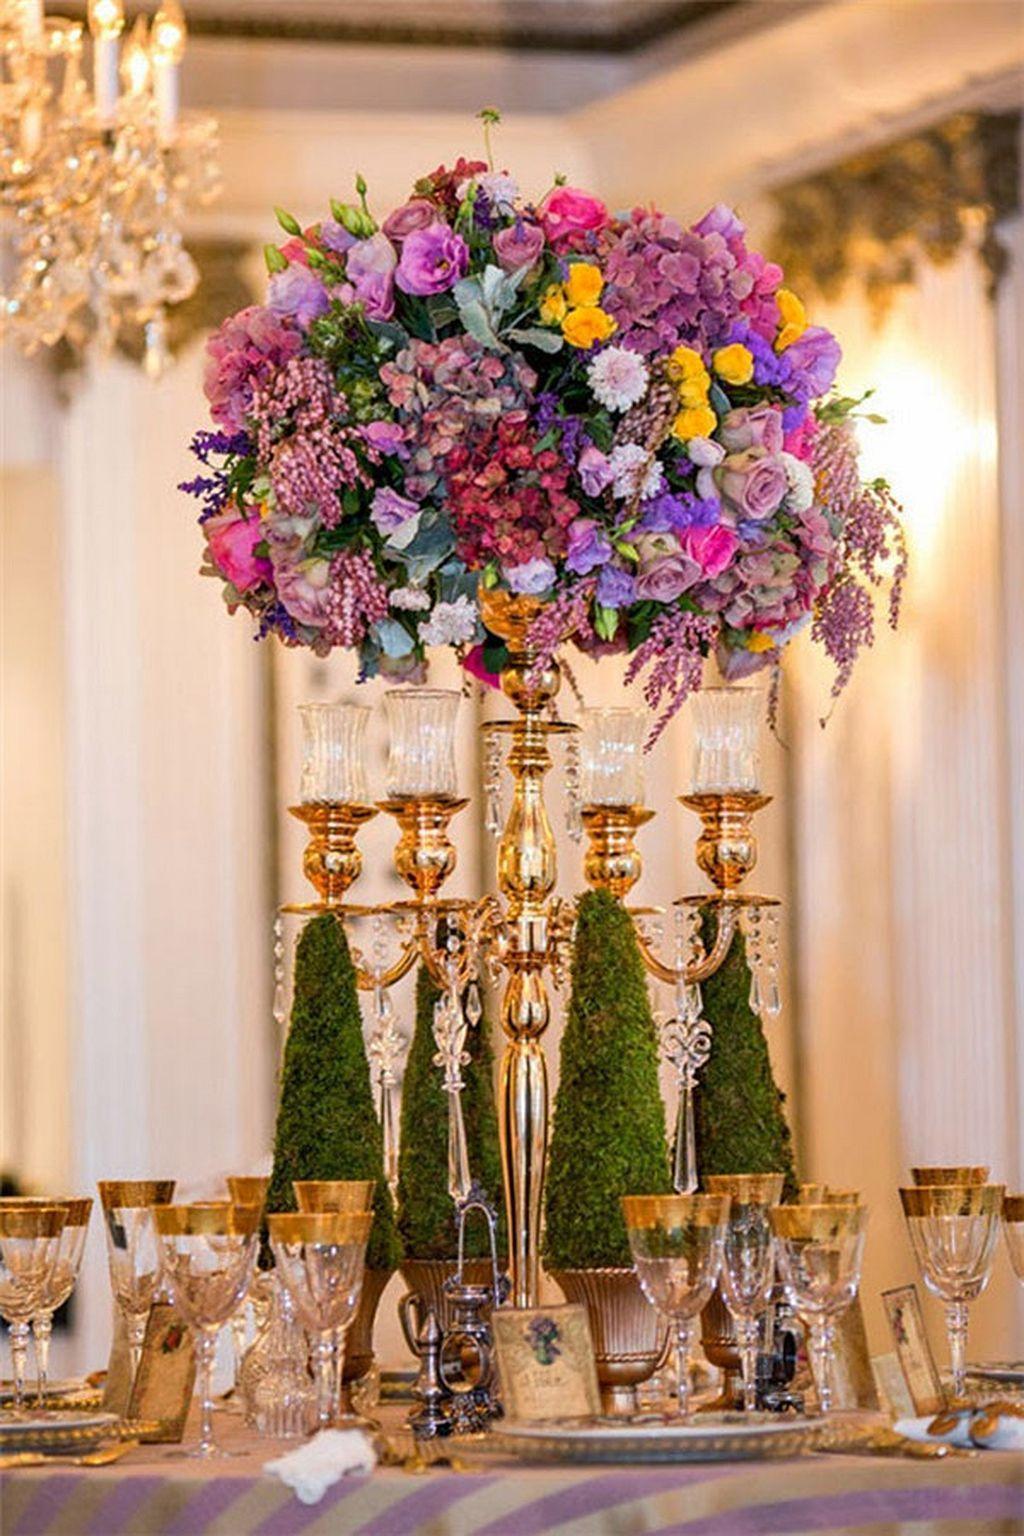 Wedding decoration ideas purple   elegant floral wedding centerpiece ideas   Floral wedding